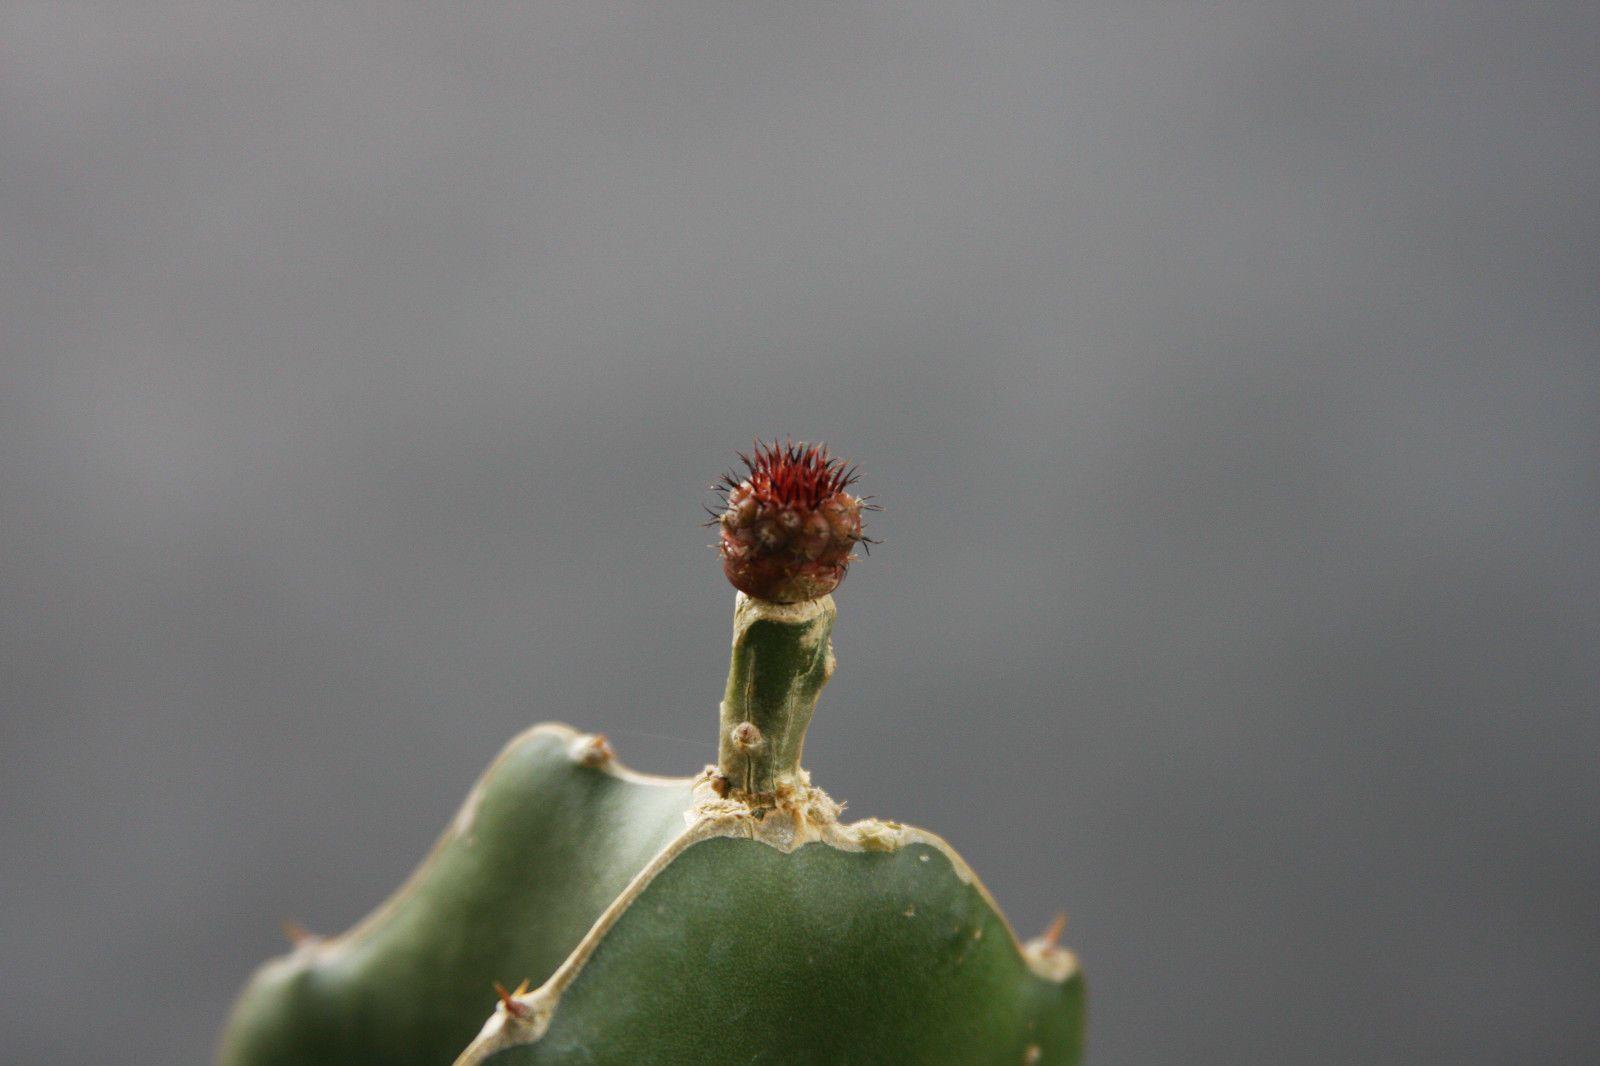 Hylocereus undatus grafting stock  cactus seed 20 SEEDS